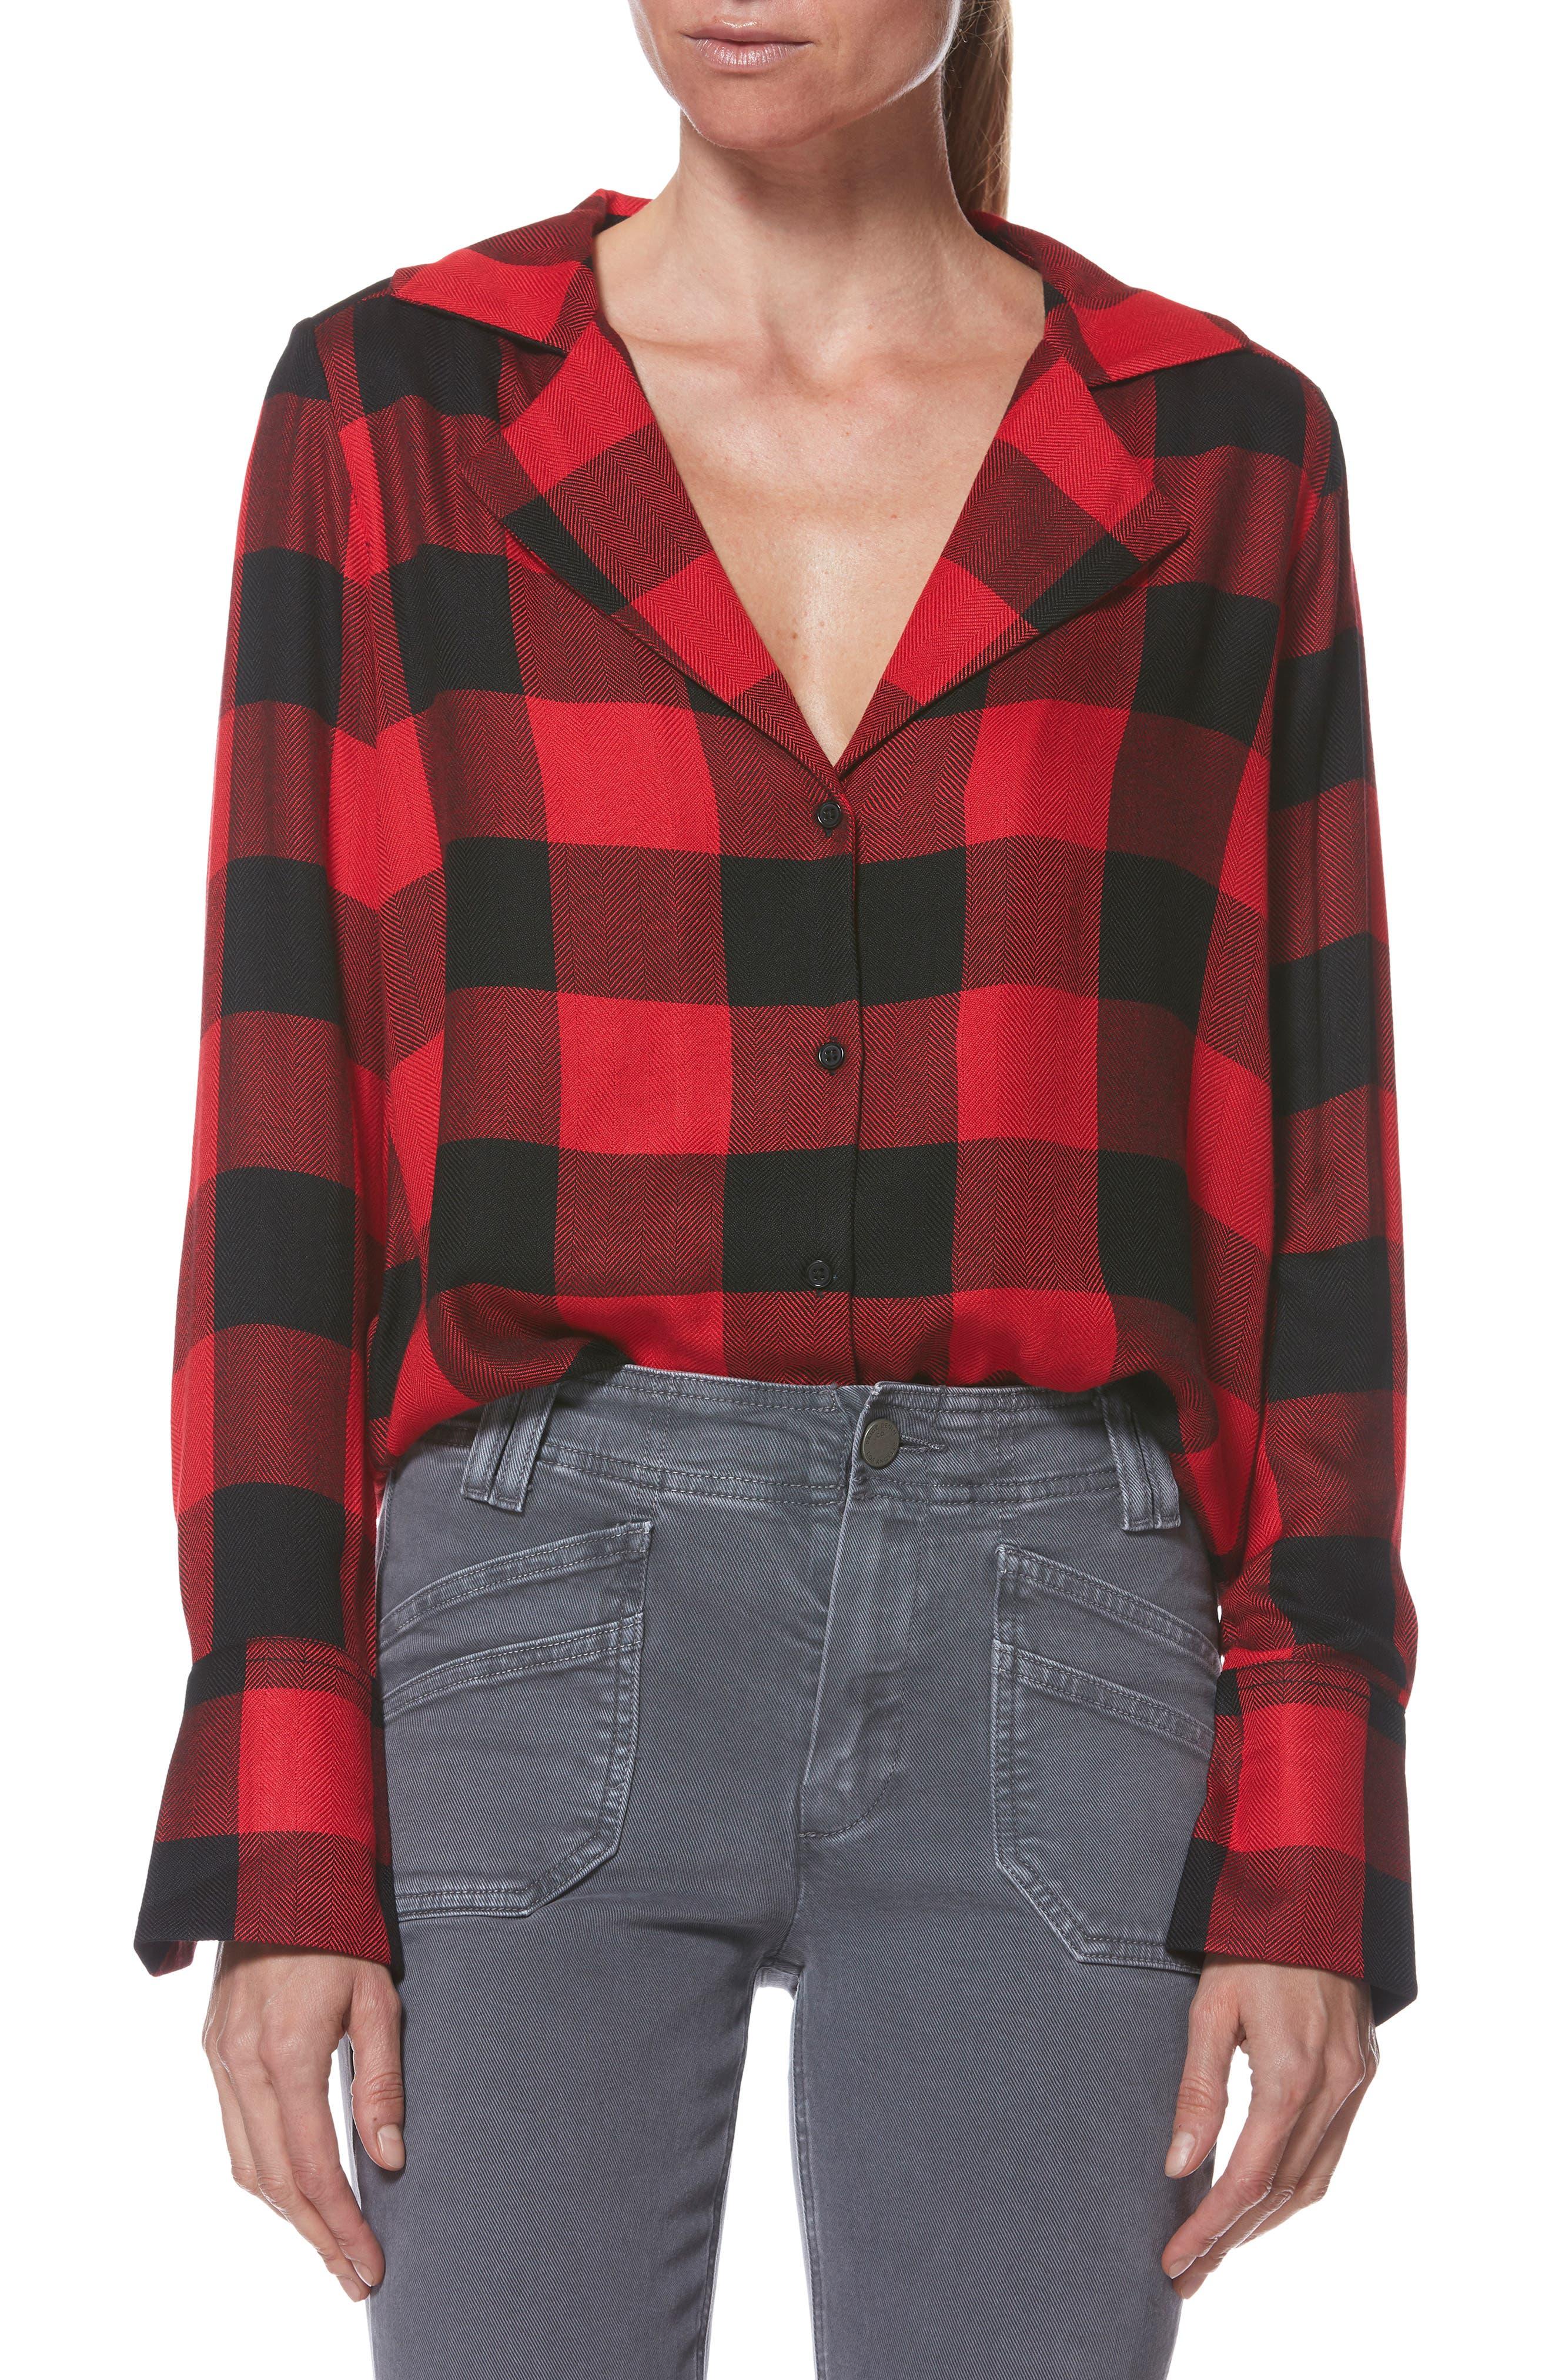 PAIGE,                             Elora Shirt,                             Main thumbnail 1, color,                             TRUE RED / BLACK